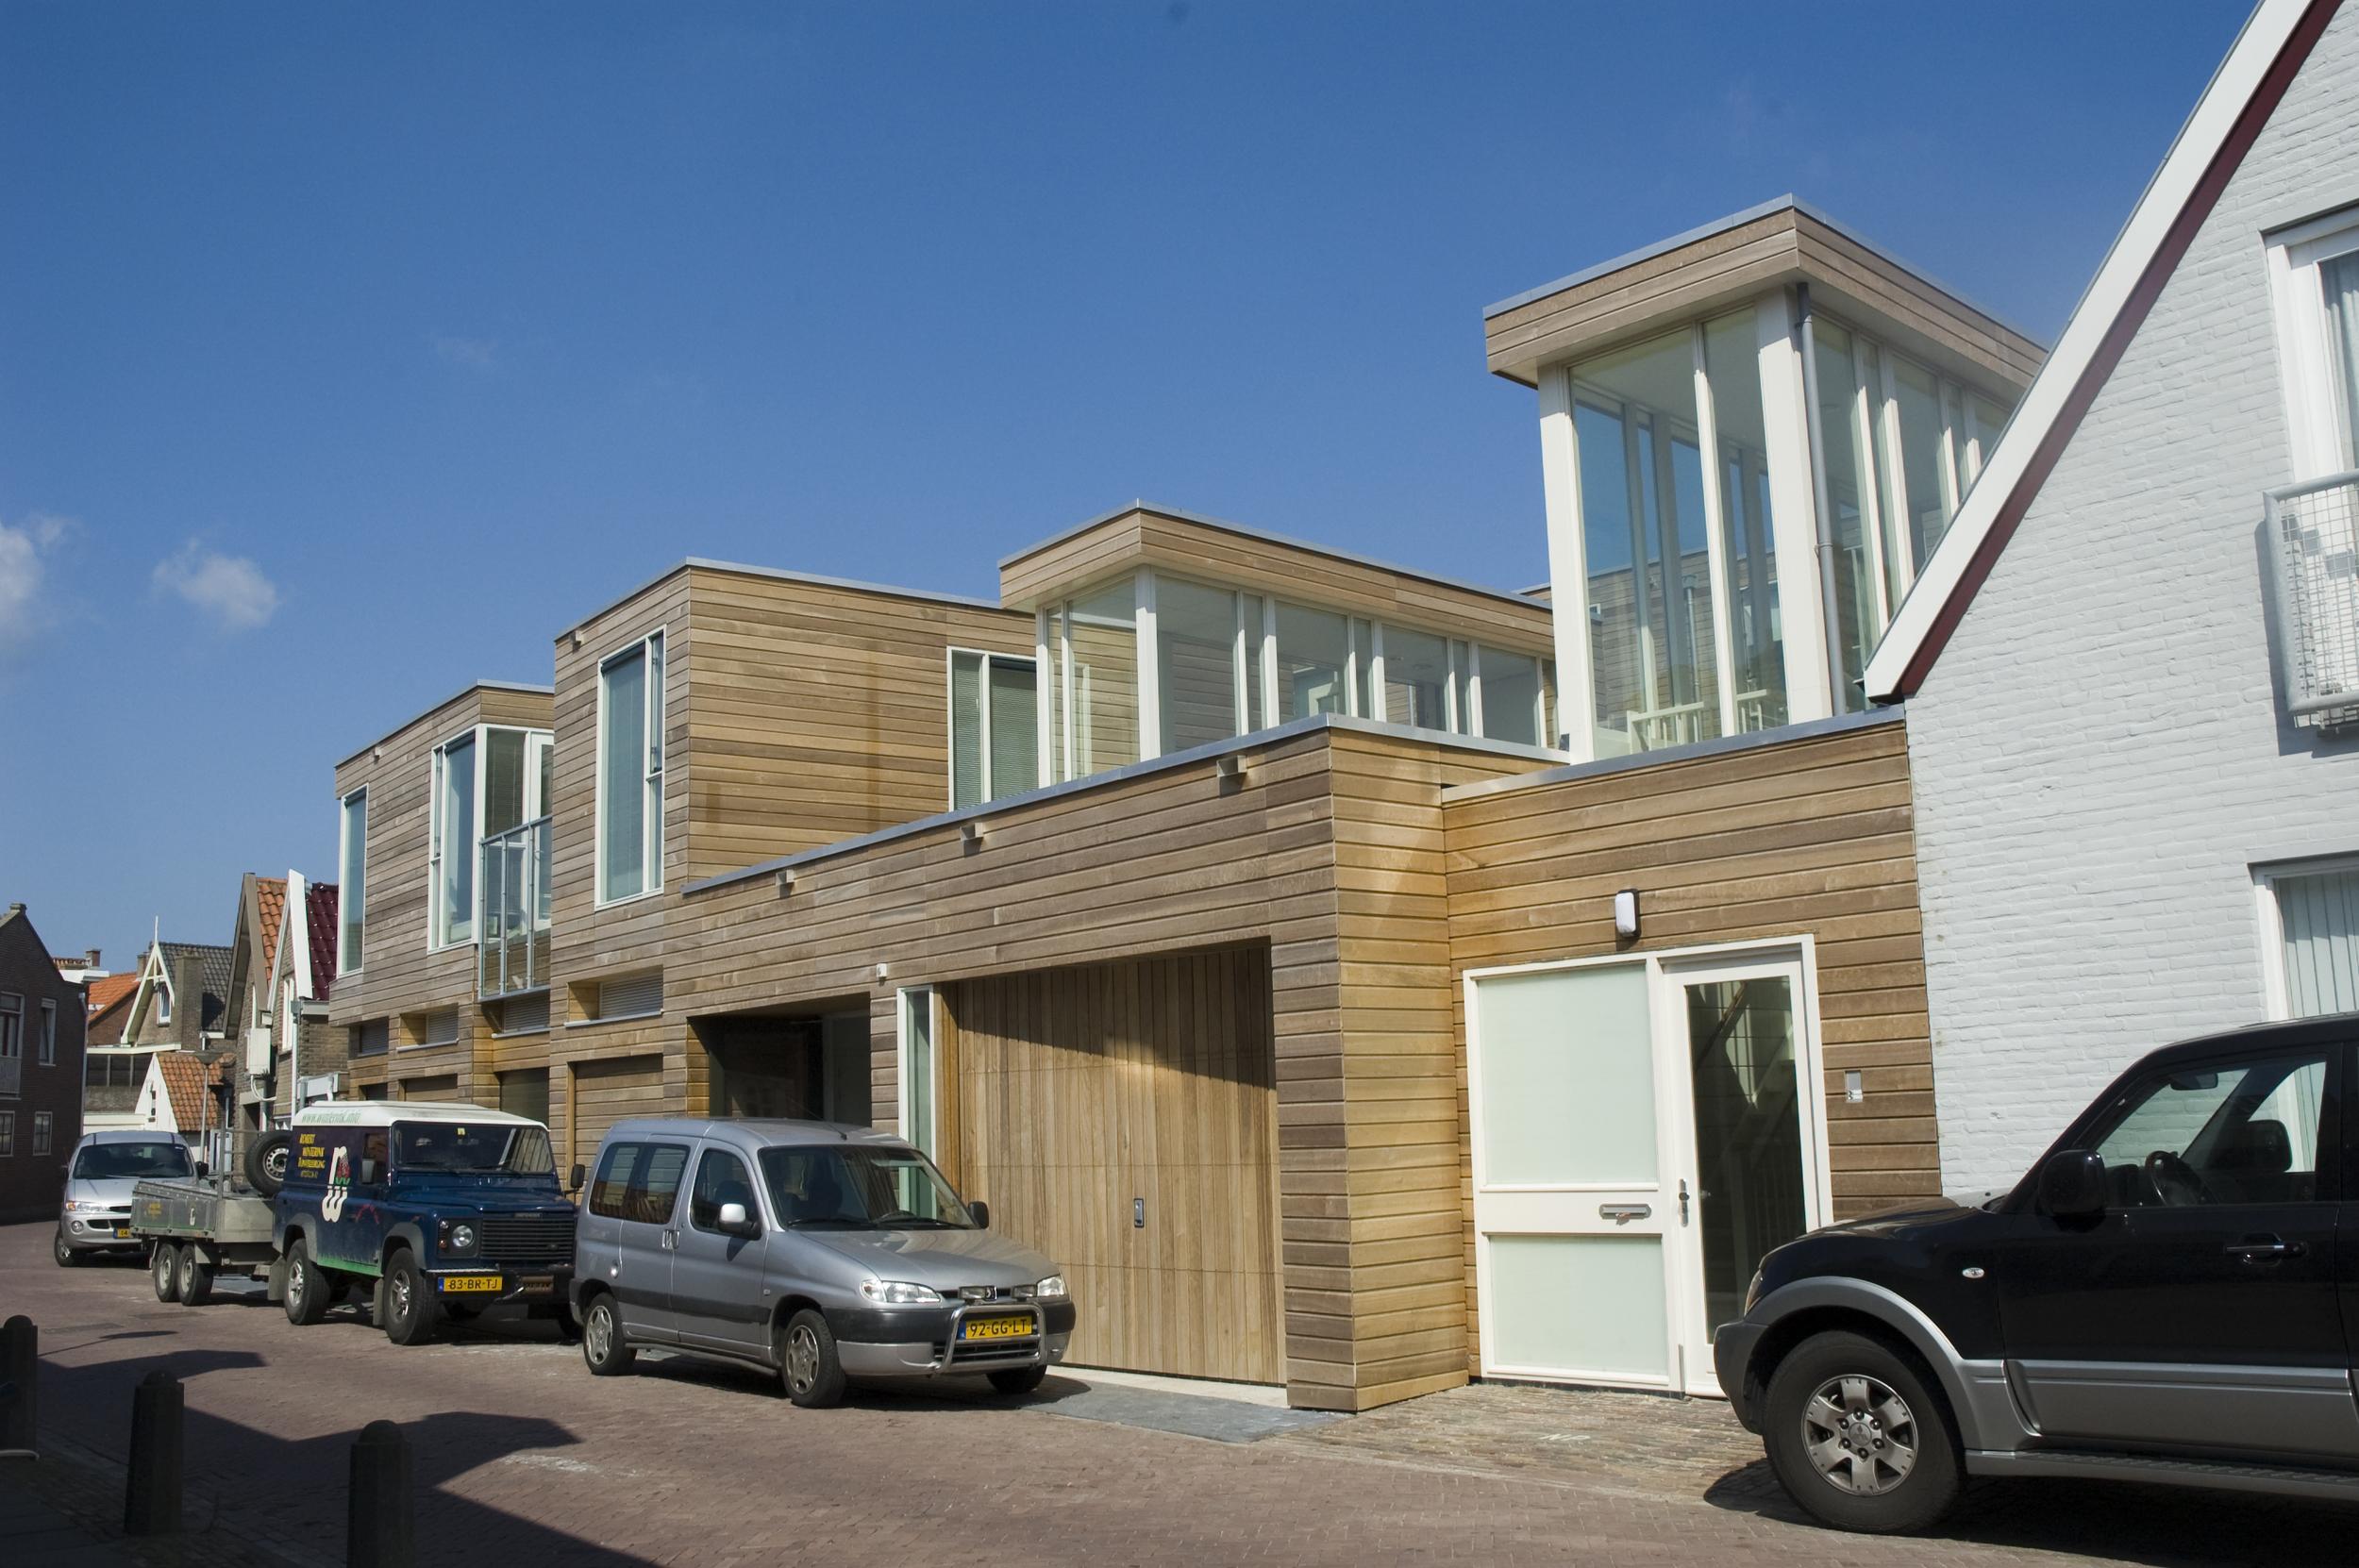 Woning-Winkels - Egmond aan Zee